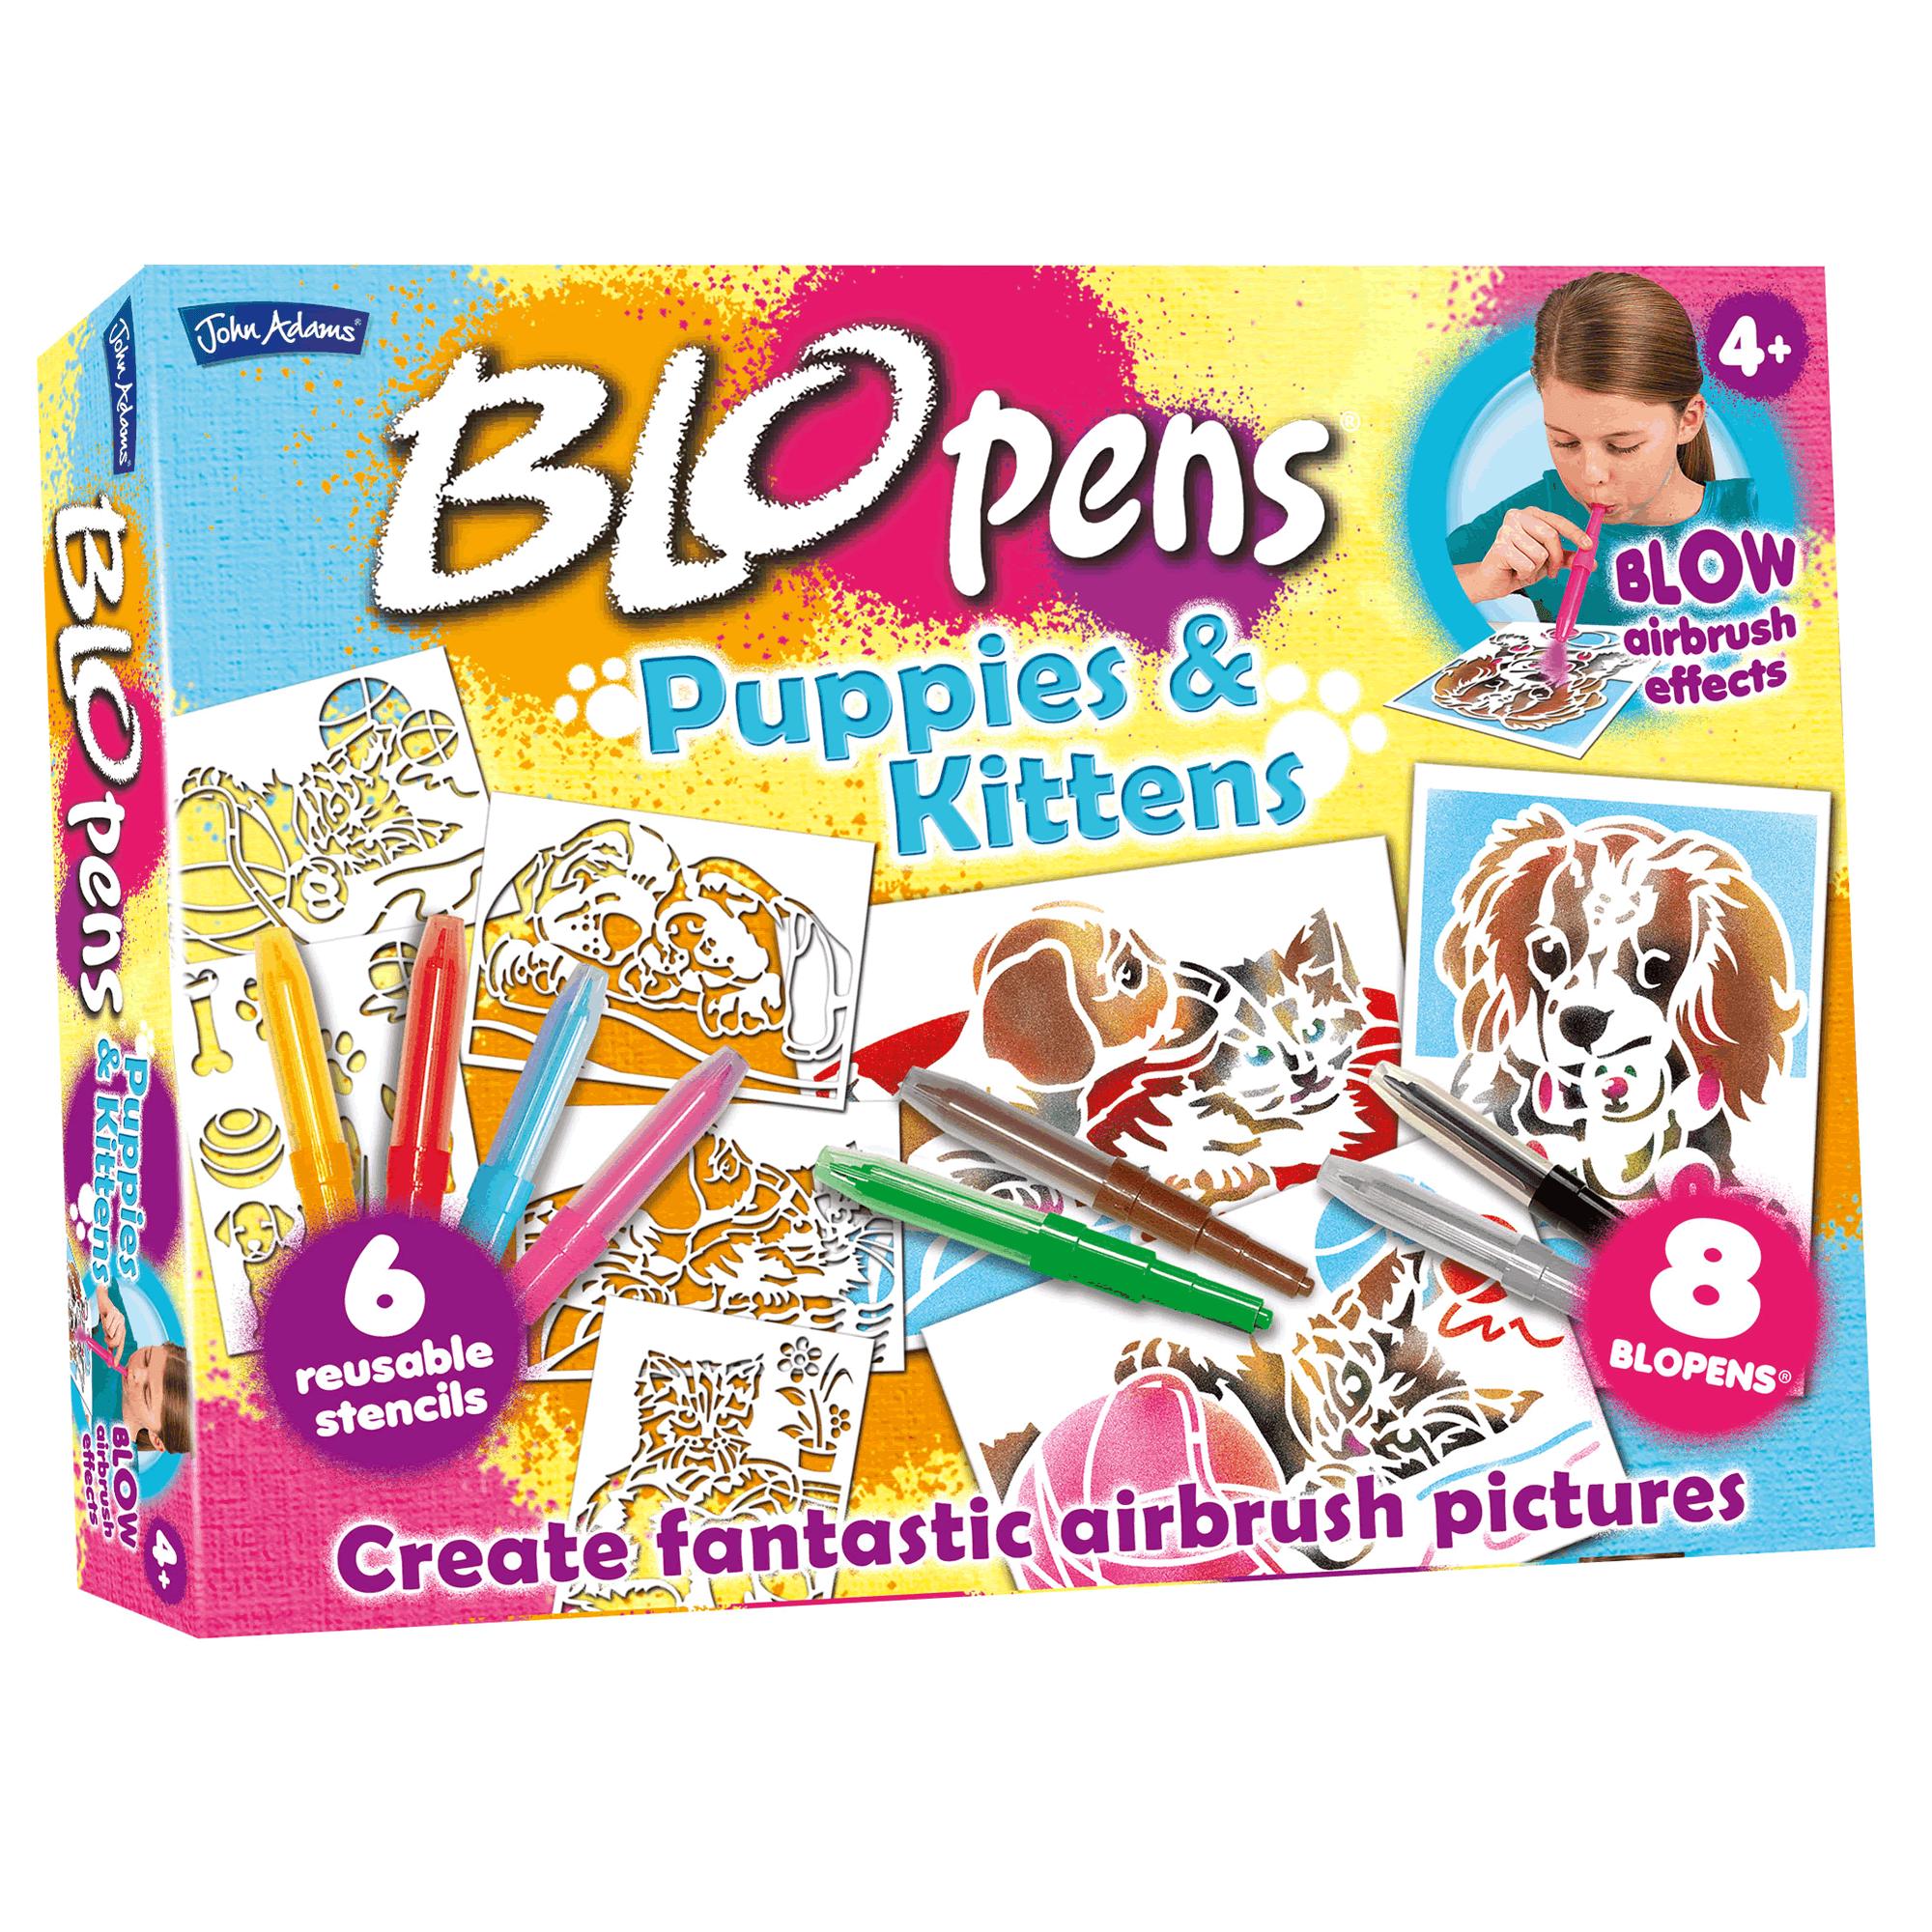 John Adams BLO PENS ANIMALS ACTIVITY SET 8 BloPens Airbrush Effect